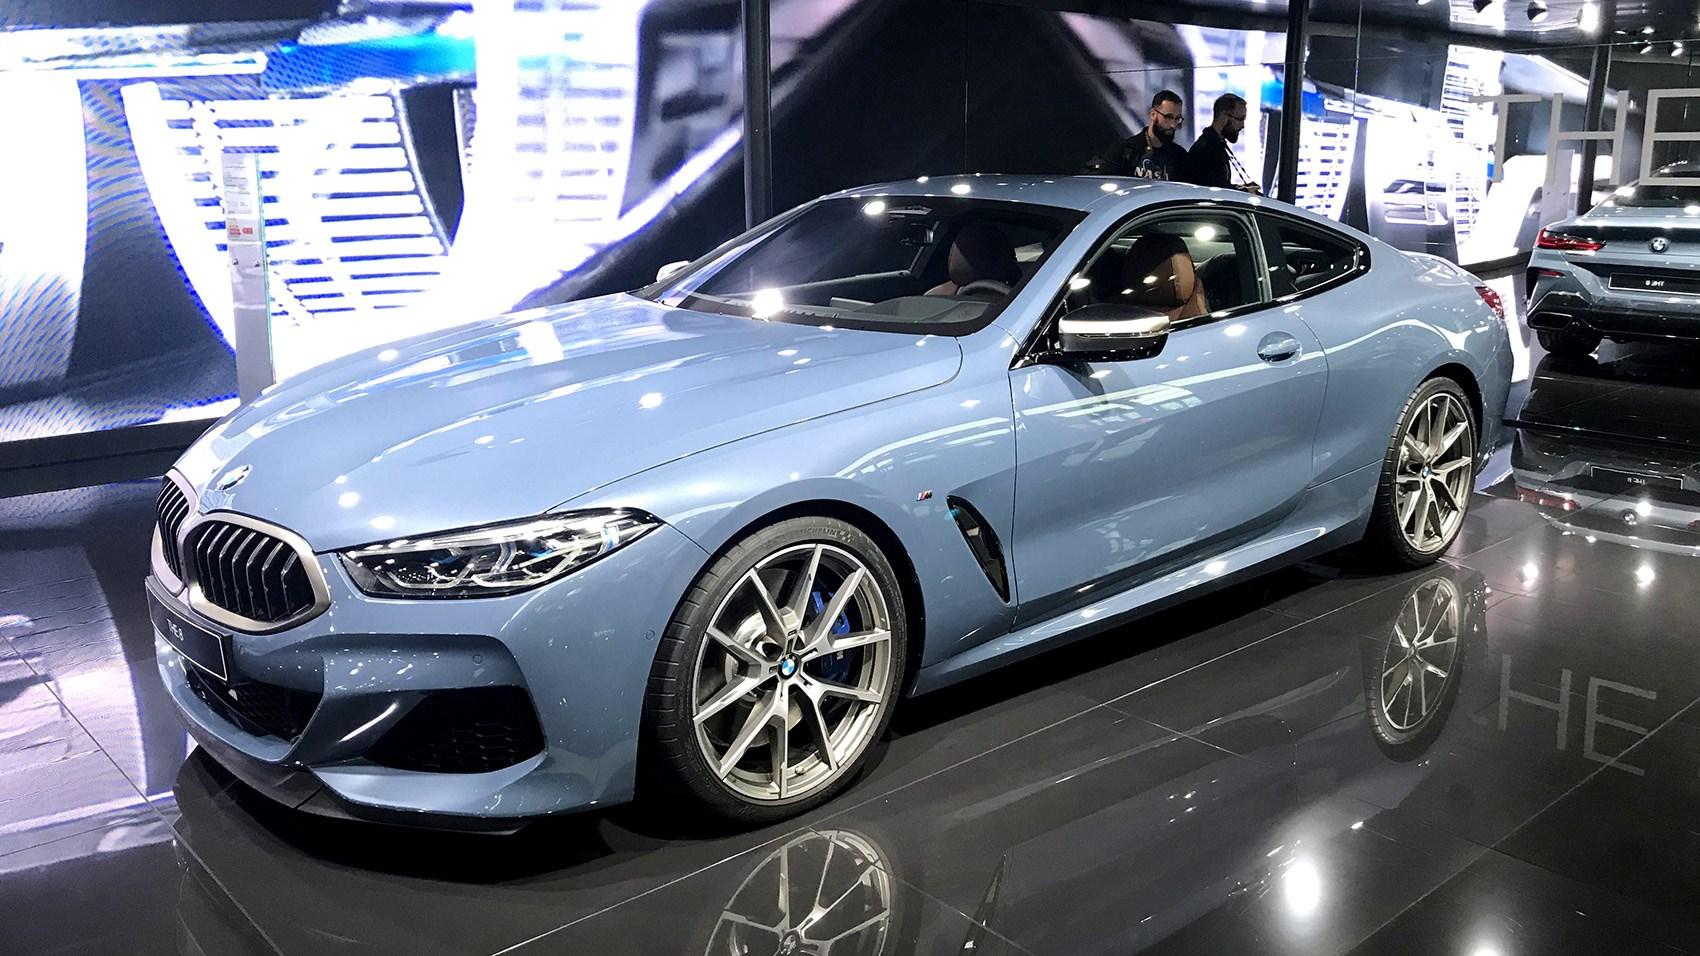 New BMW Series Unveiled In Paris CAR Magazine - Detroit car show august 2018